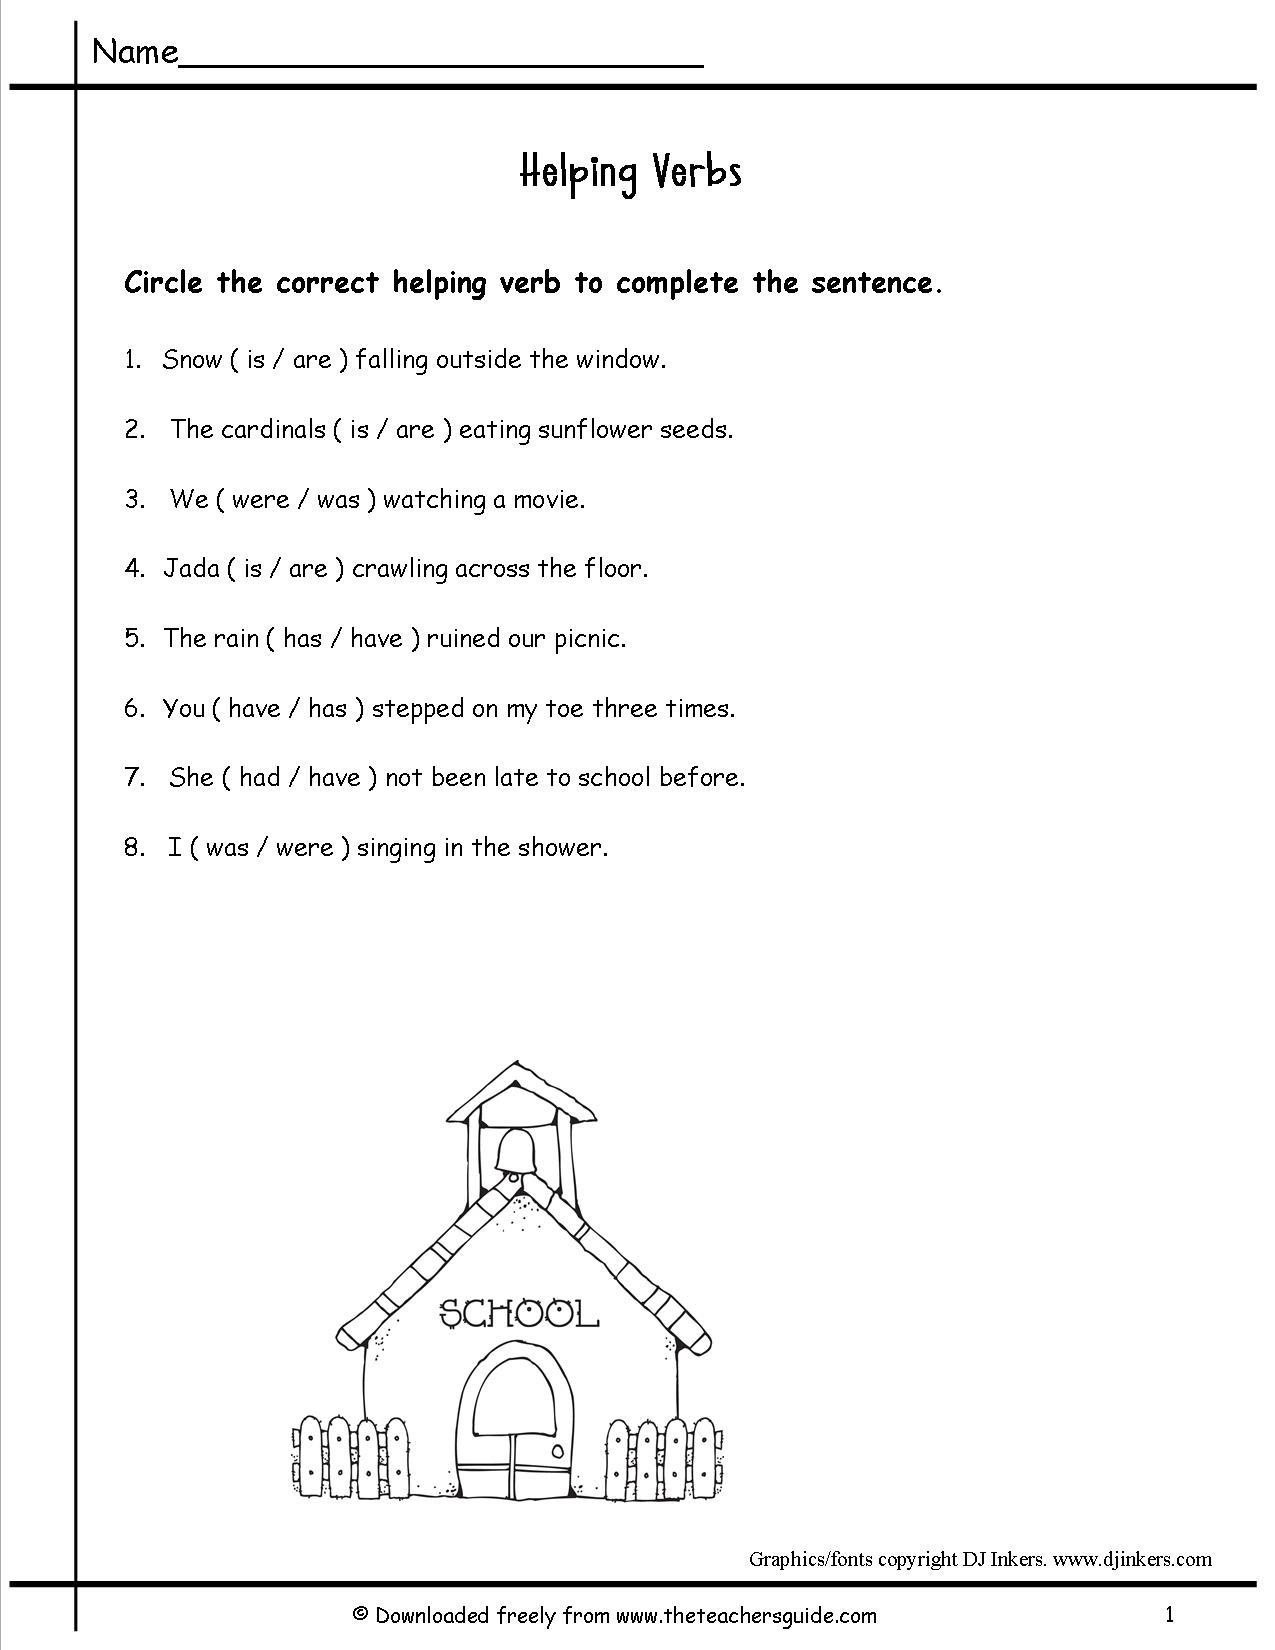 17 Best Images Of Free Verb Worksheets 2nd Grade